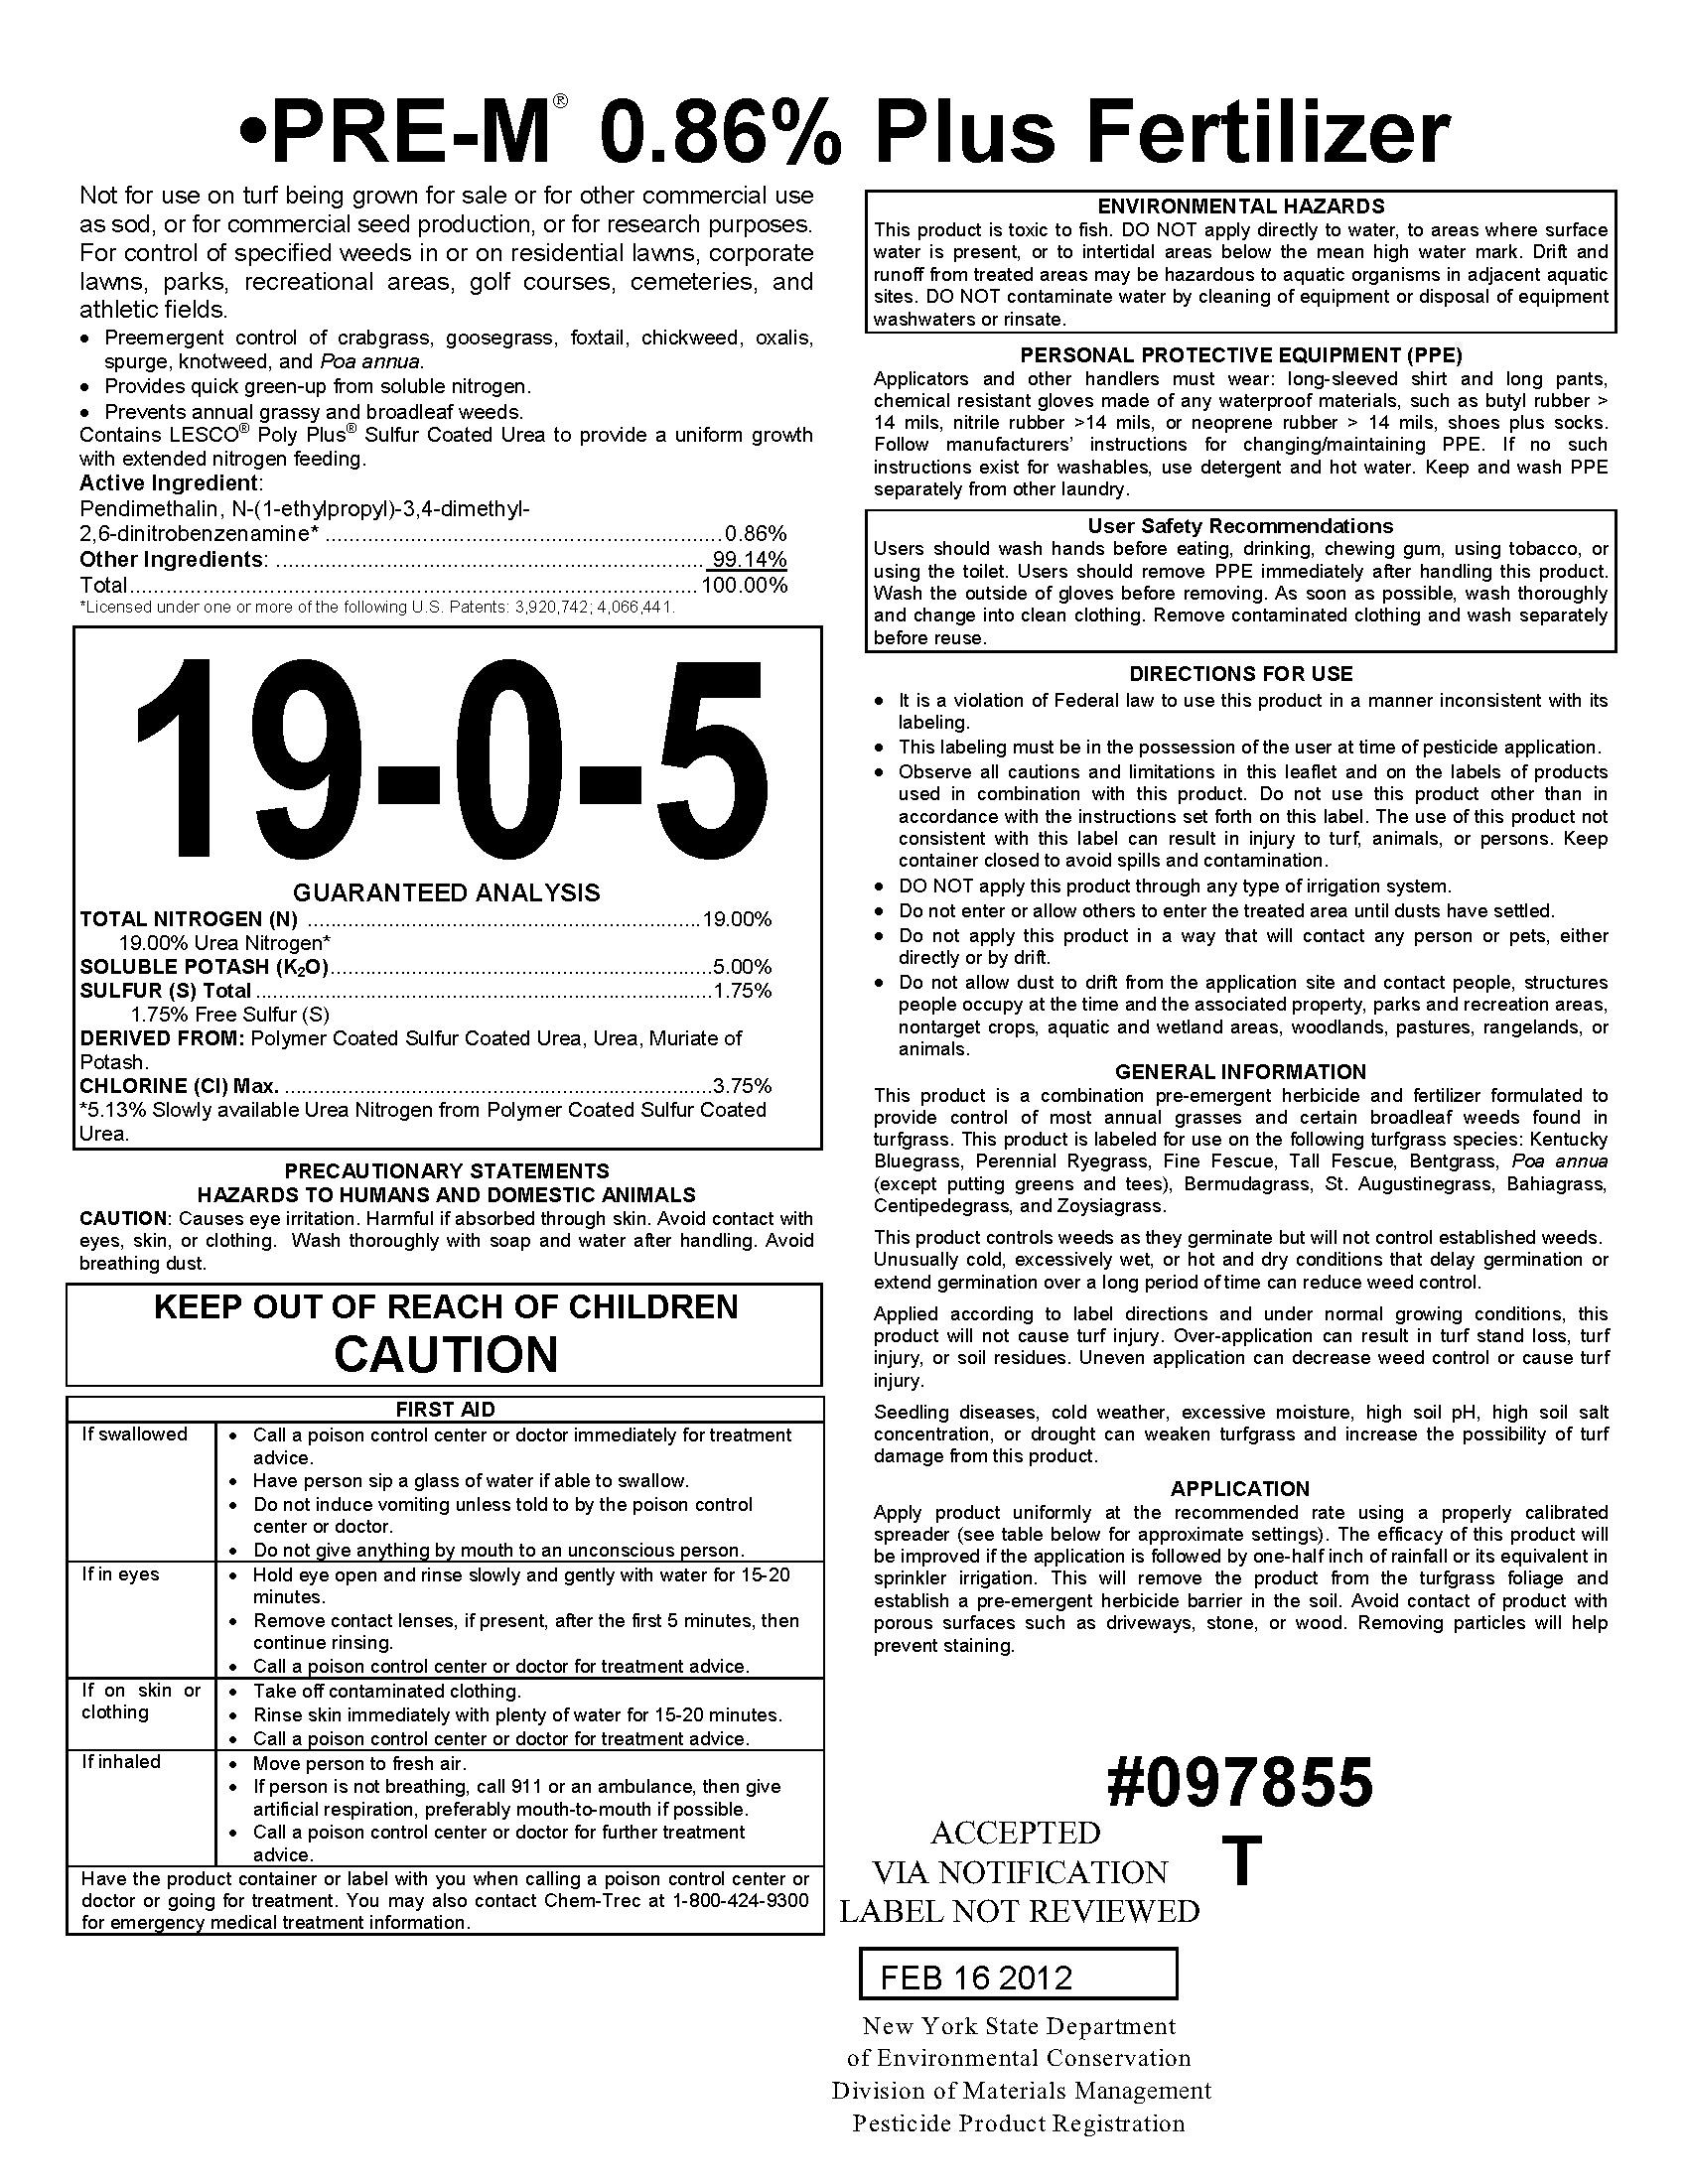 PRE M Nyspad 2012_Page_5.jpg